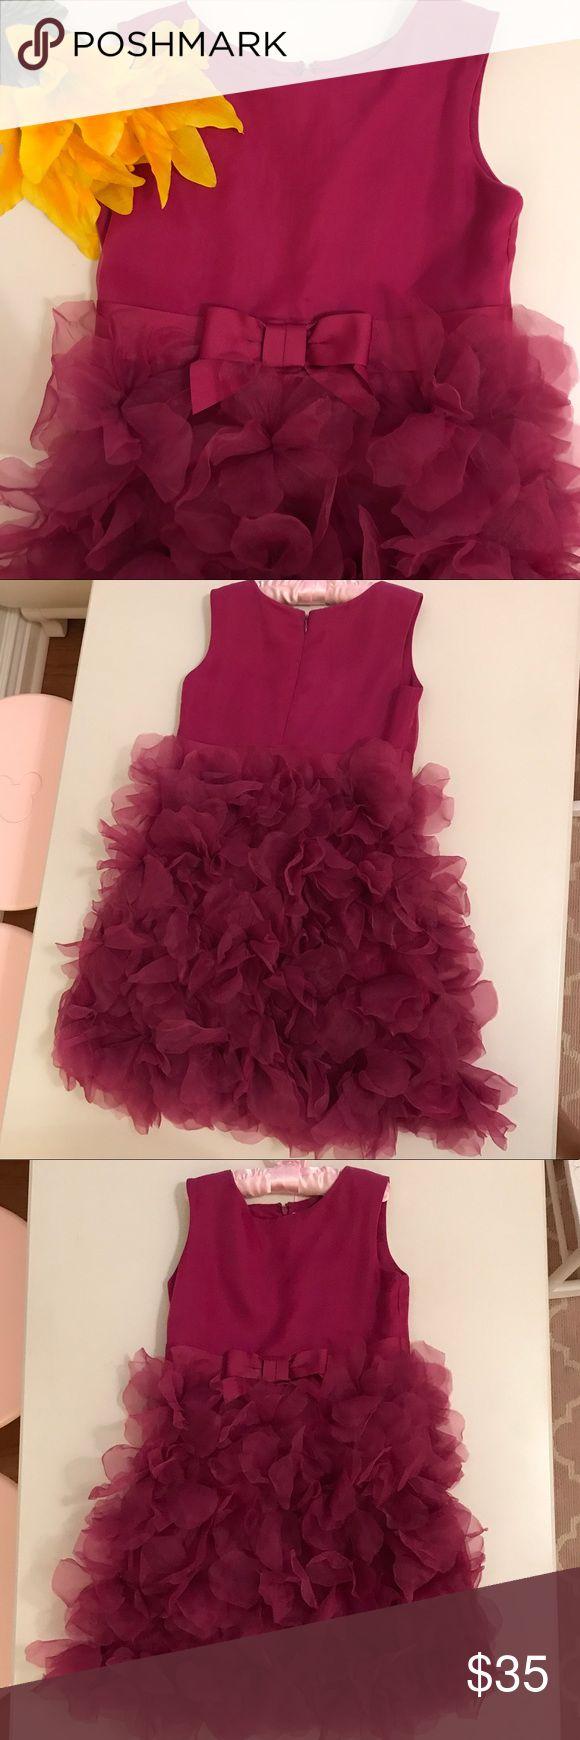 Neiman Marcus for Target Girls Ocassion Dress NWT Beautiful dress! Fucsia Neiman Marcus for Target / Marchesa Dresses Formal